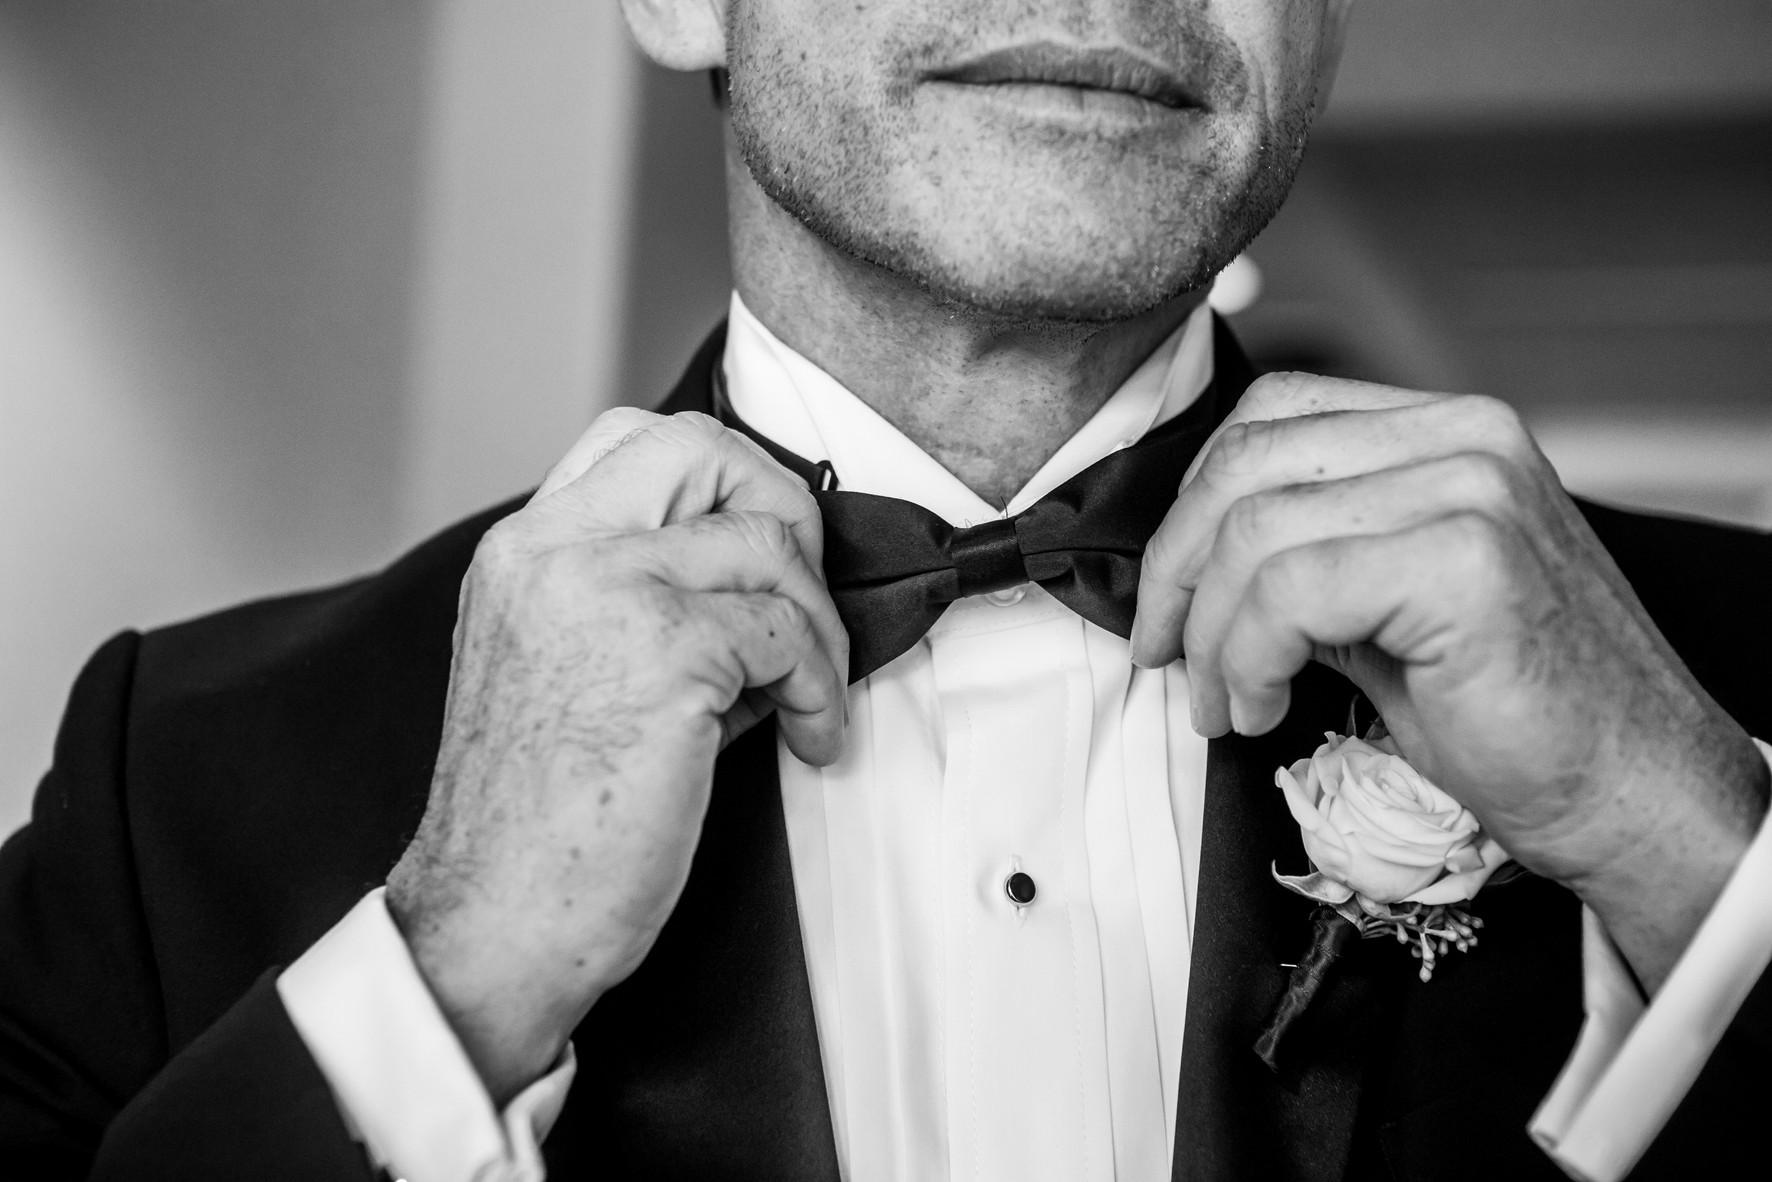 San Diego Wedding Photographer, Berlynn Photography, San Diego Wedding Photography, groom black and white bow tie